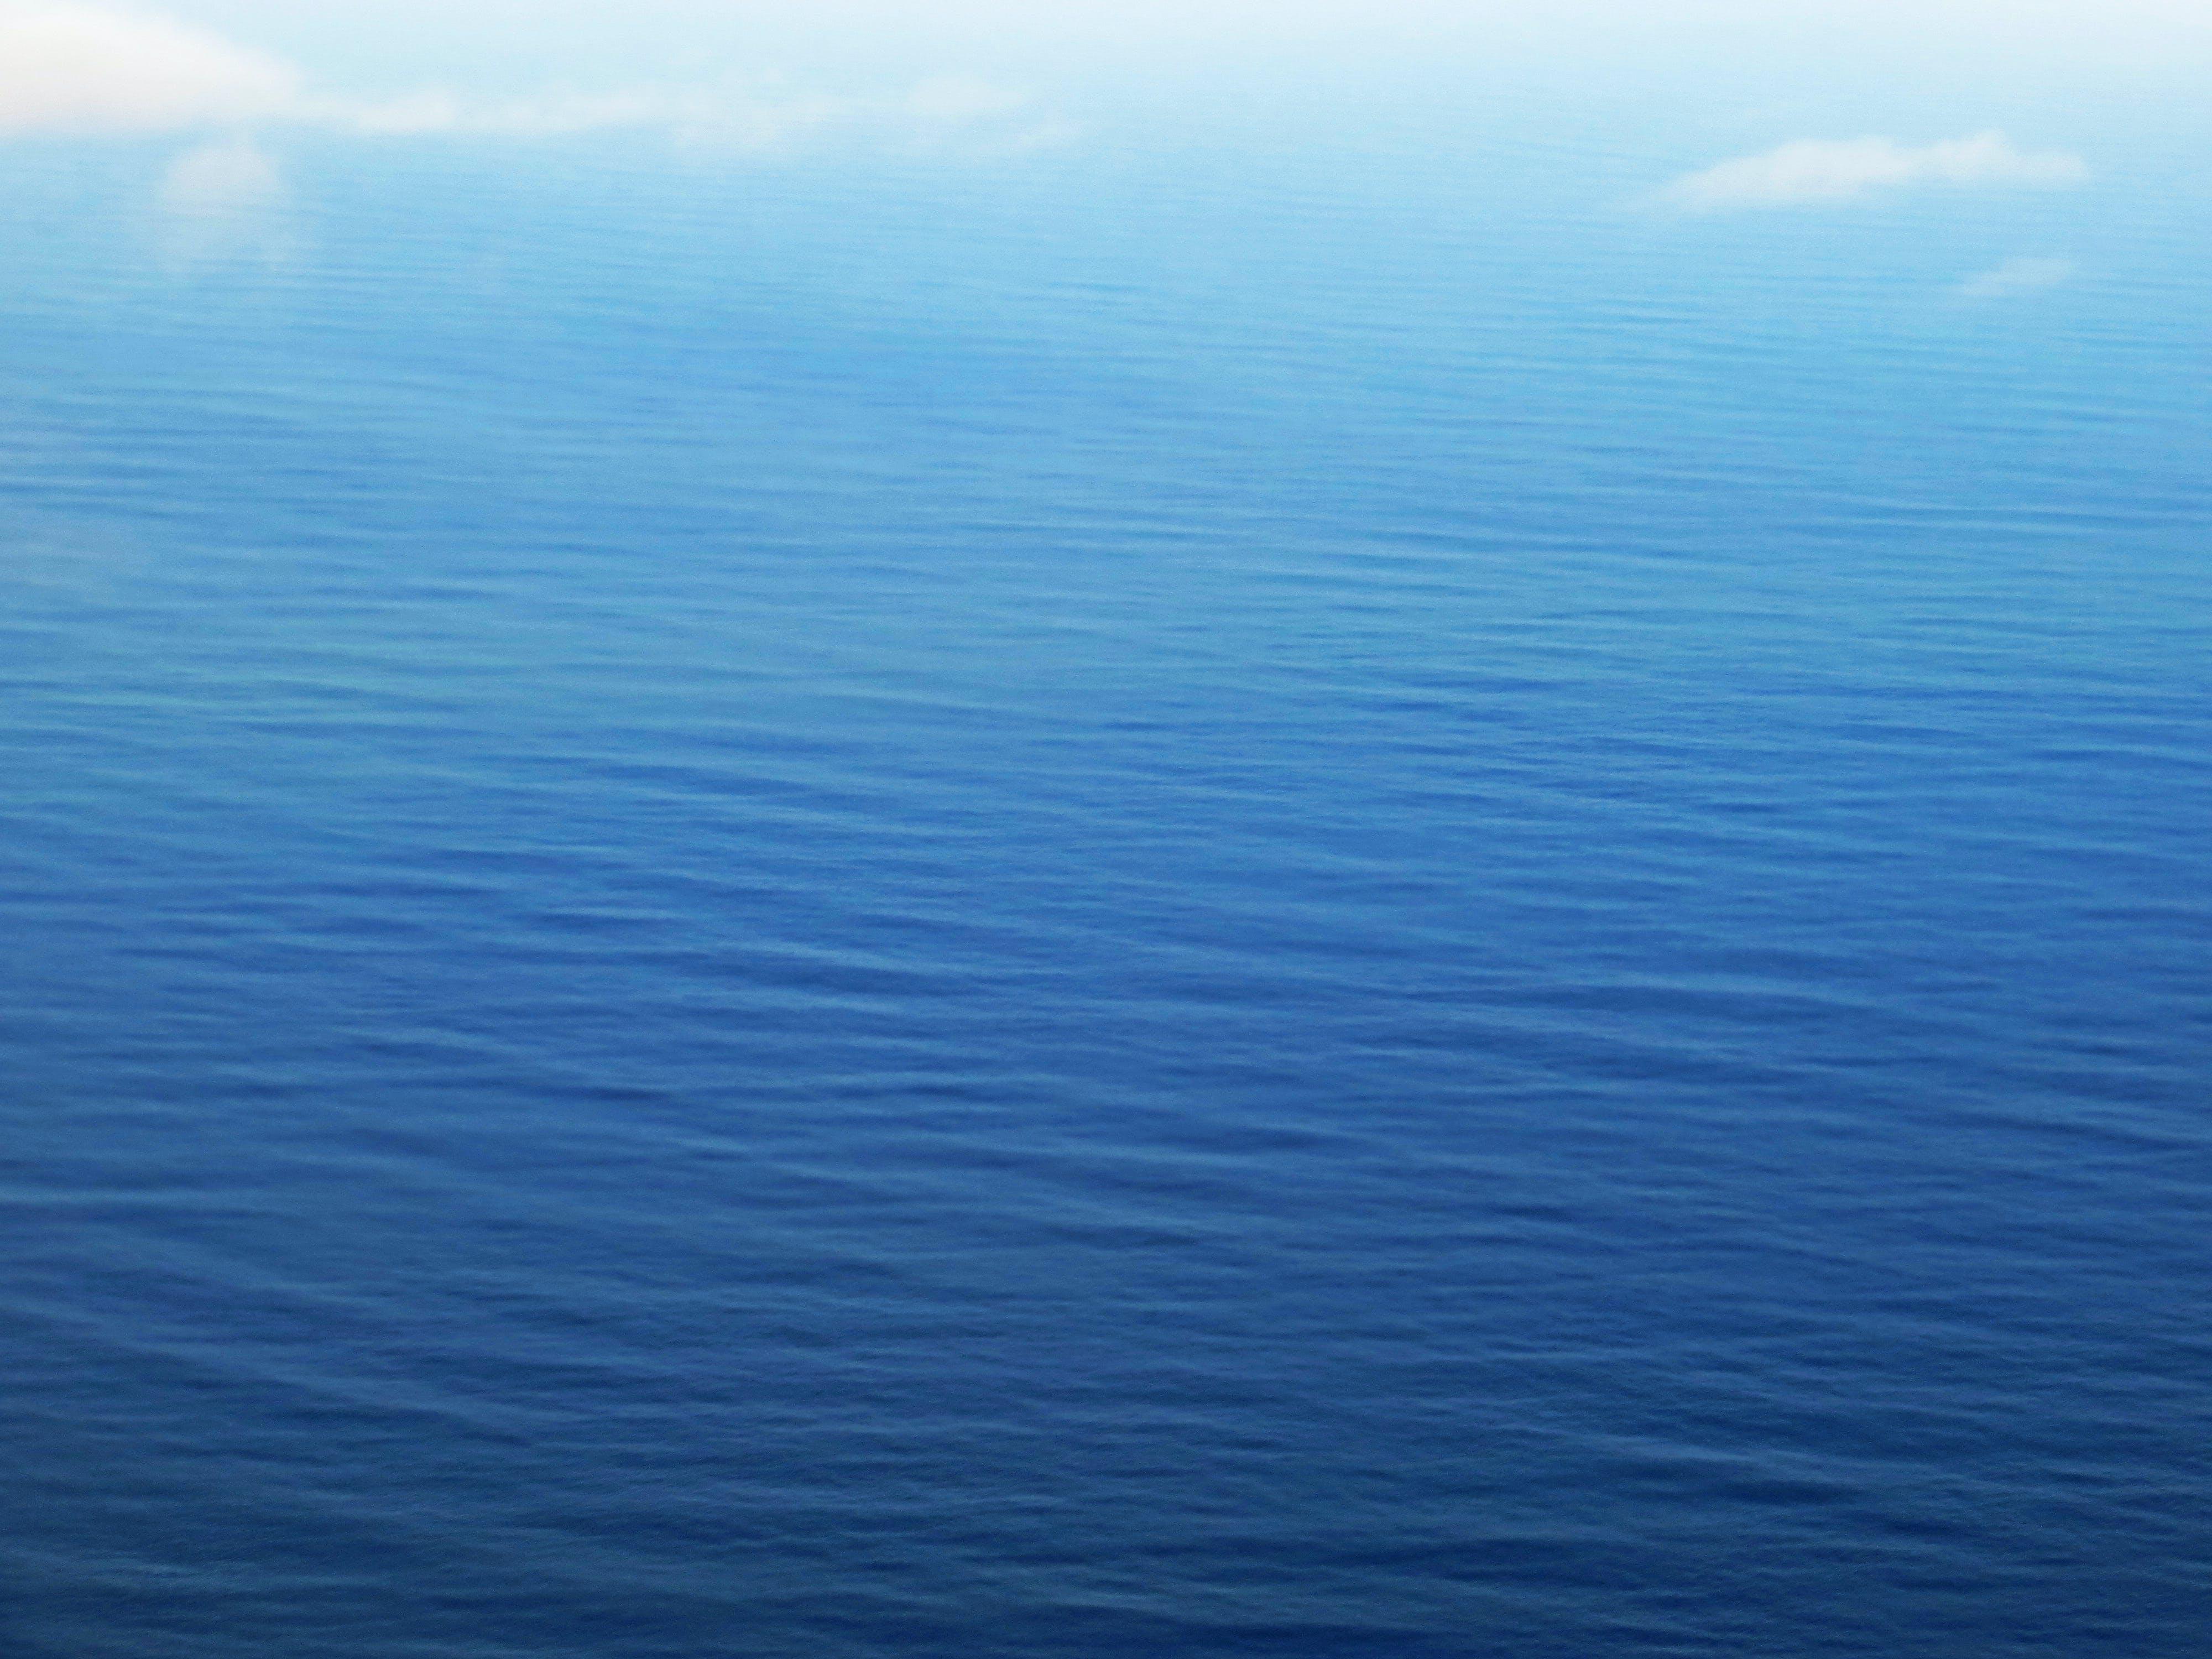 Kostenloses Stock Foto zu blau, friedvoll, meer, ozean